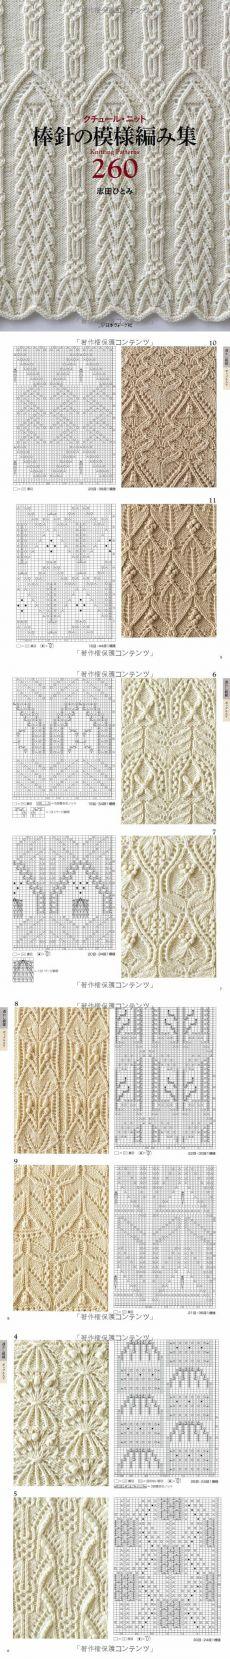 Pattern knitting collection 260 by Shida Hitomi